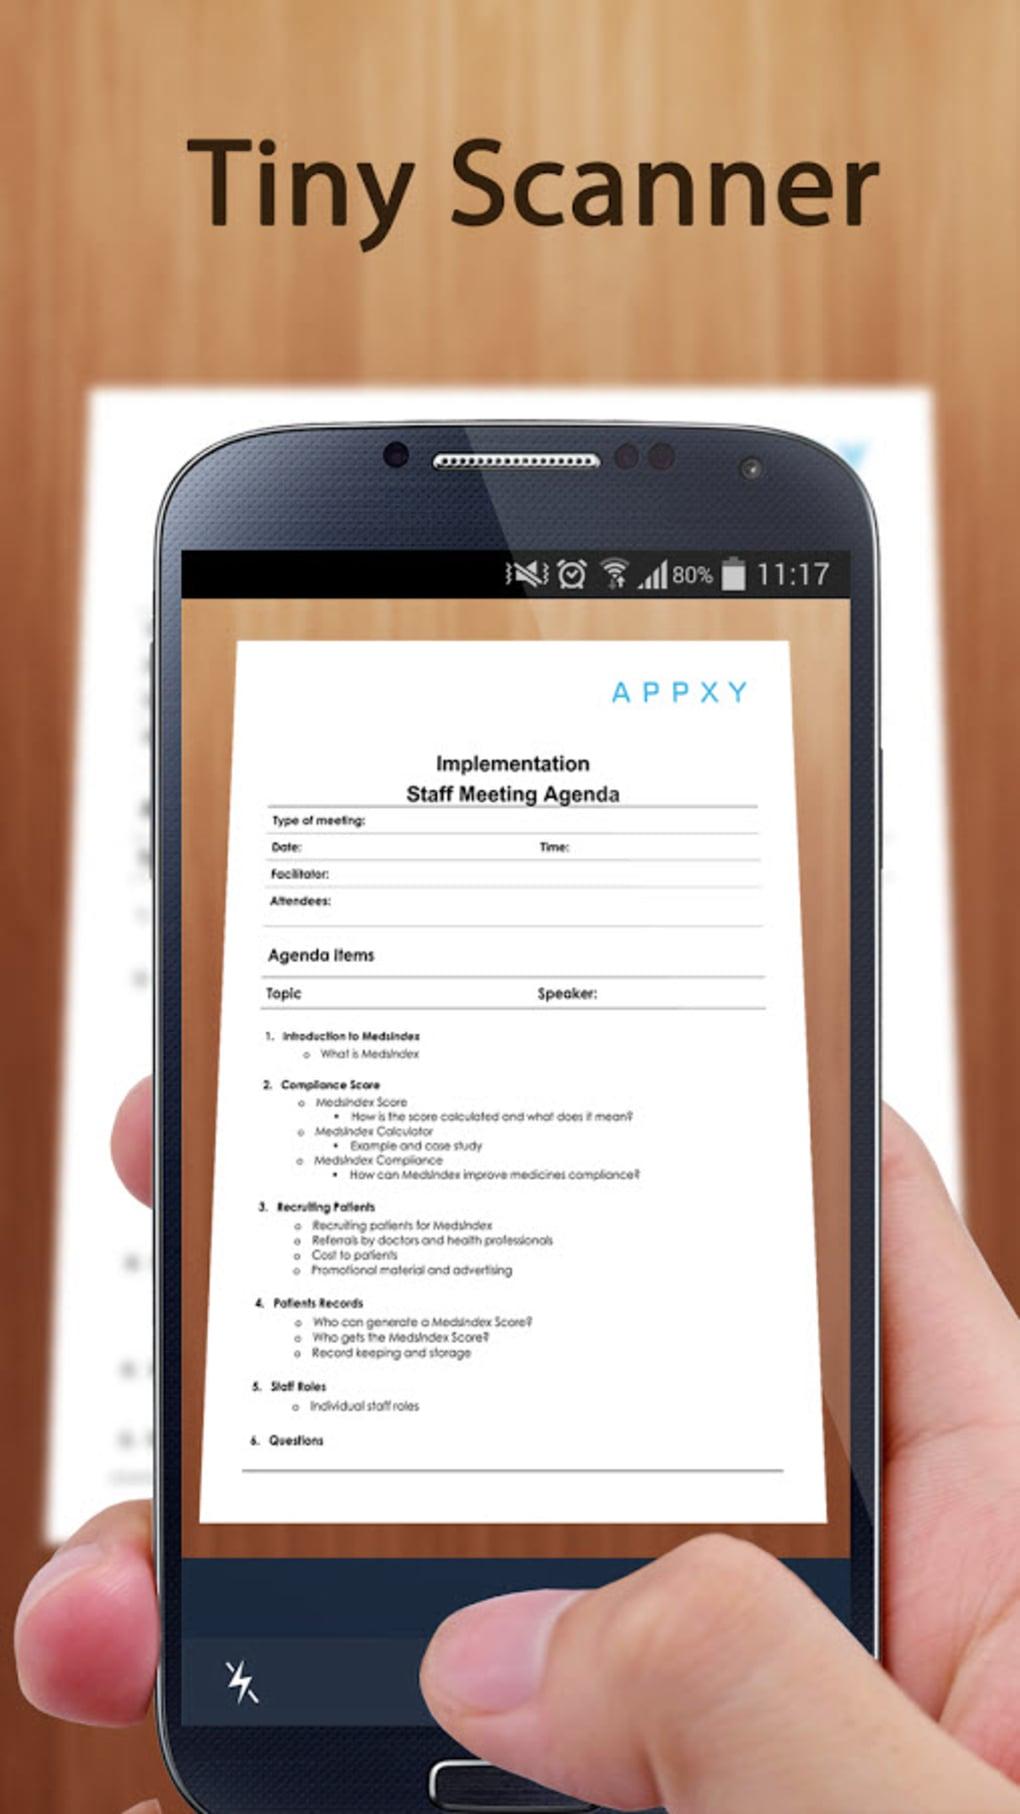 Tiny Scanner - PDF Scanner App for Android - Download